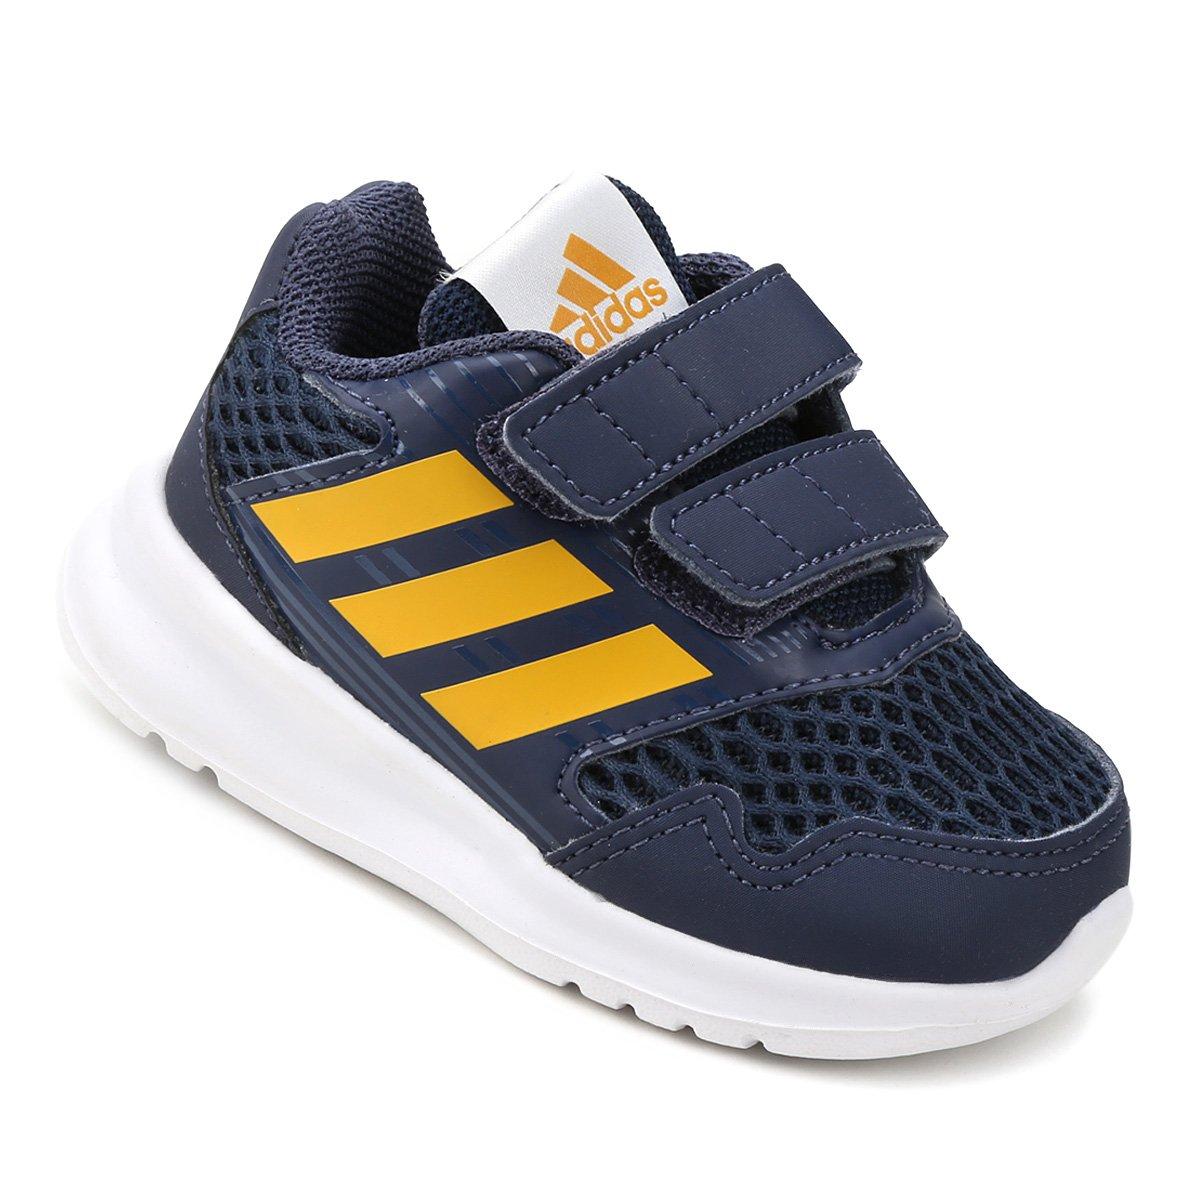 641ebe826bb57 Tênis Infantil Adidas Altarun Cf Masculino - Compre Agora